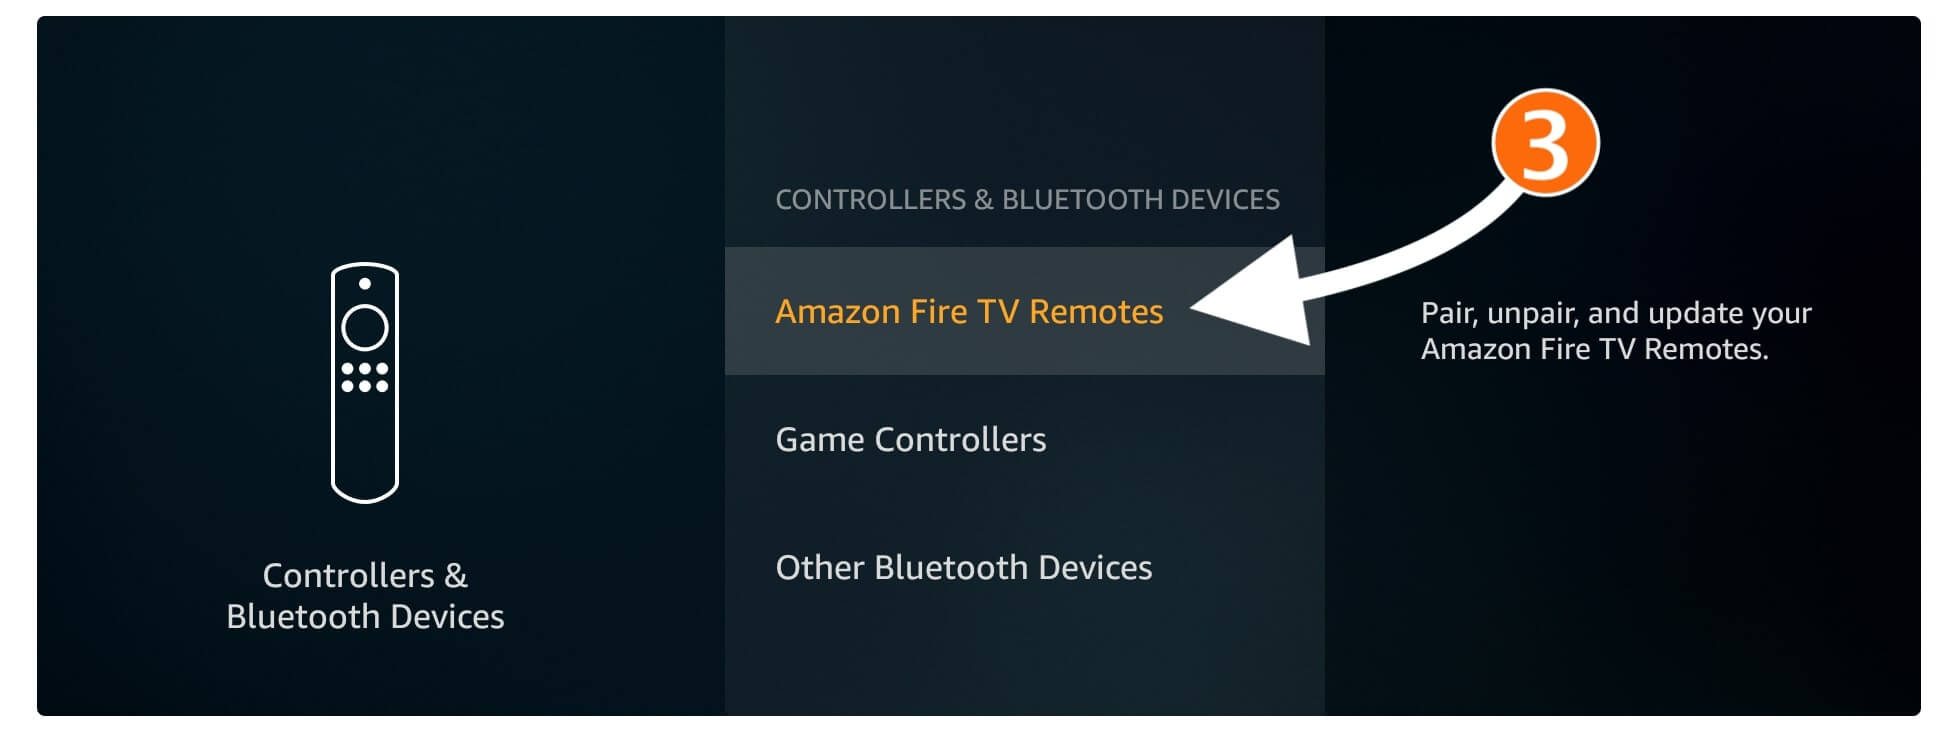 Amazon-Fire-Tv-Remotes